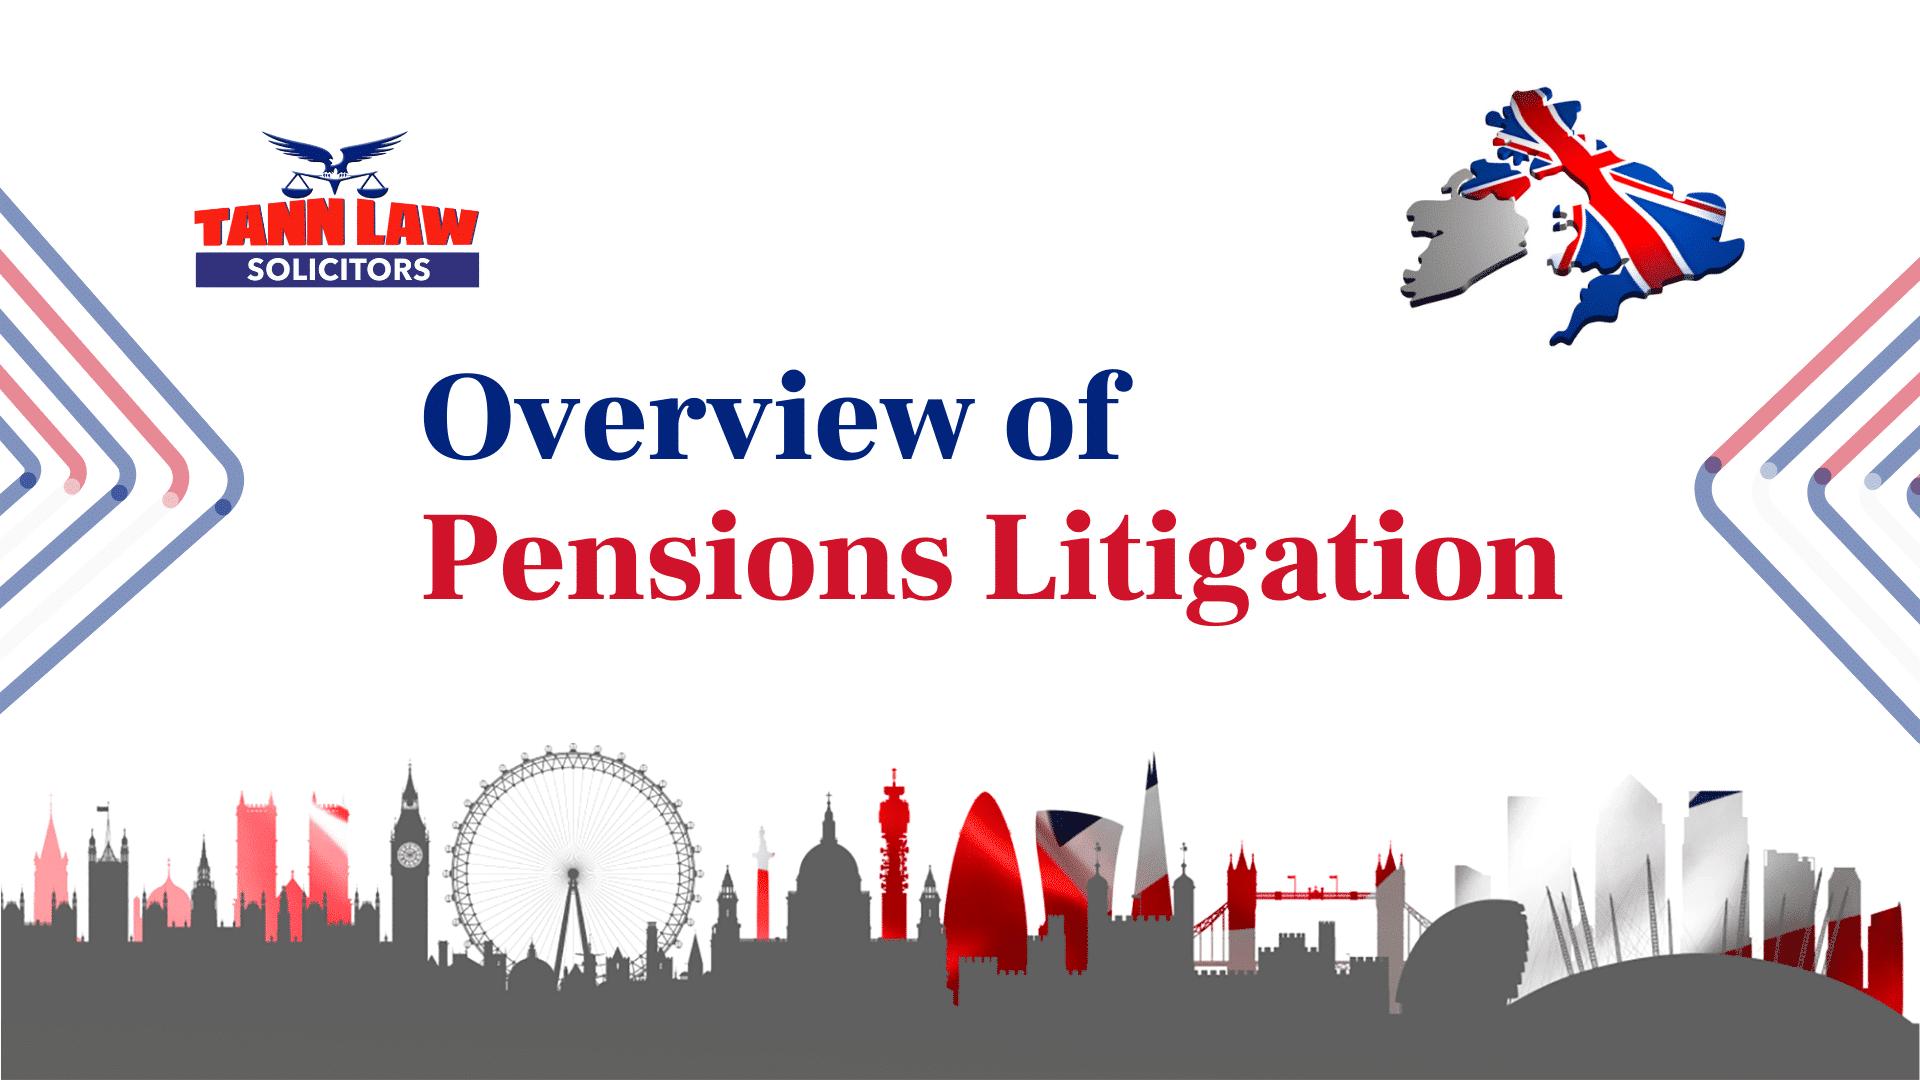 Pensions Litigation